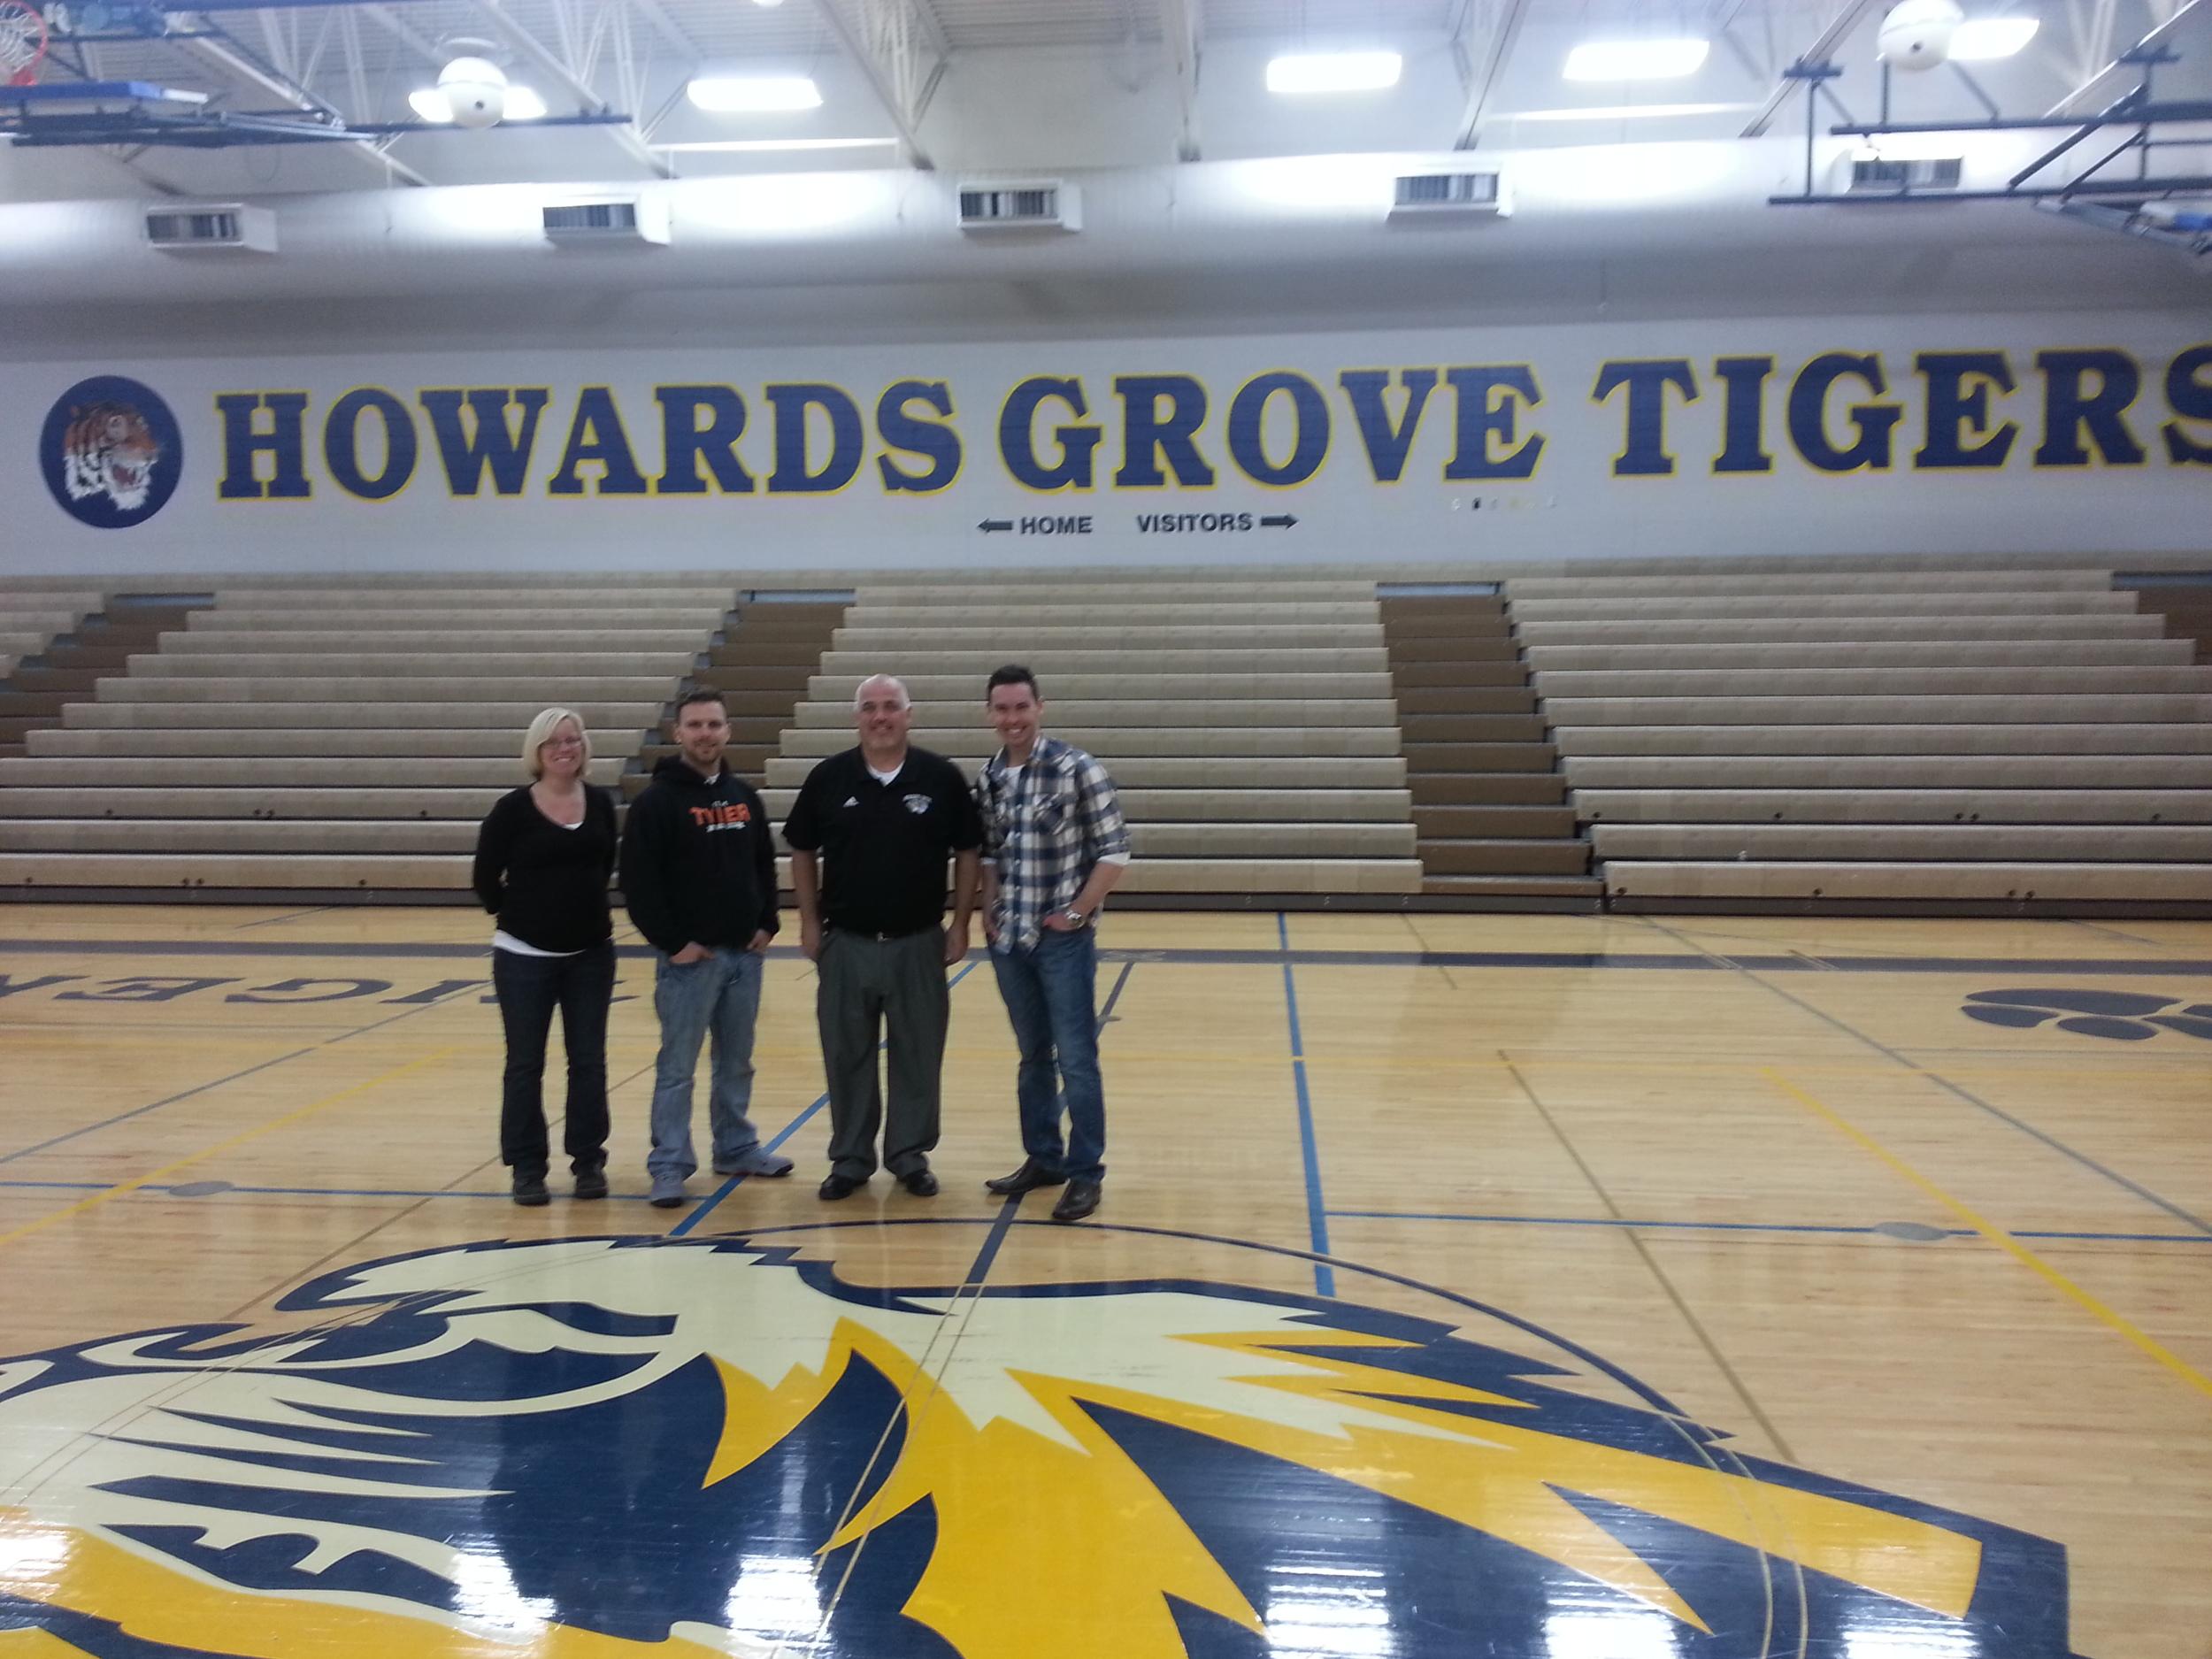 Howards Grove High School - 3/24/14